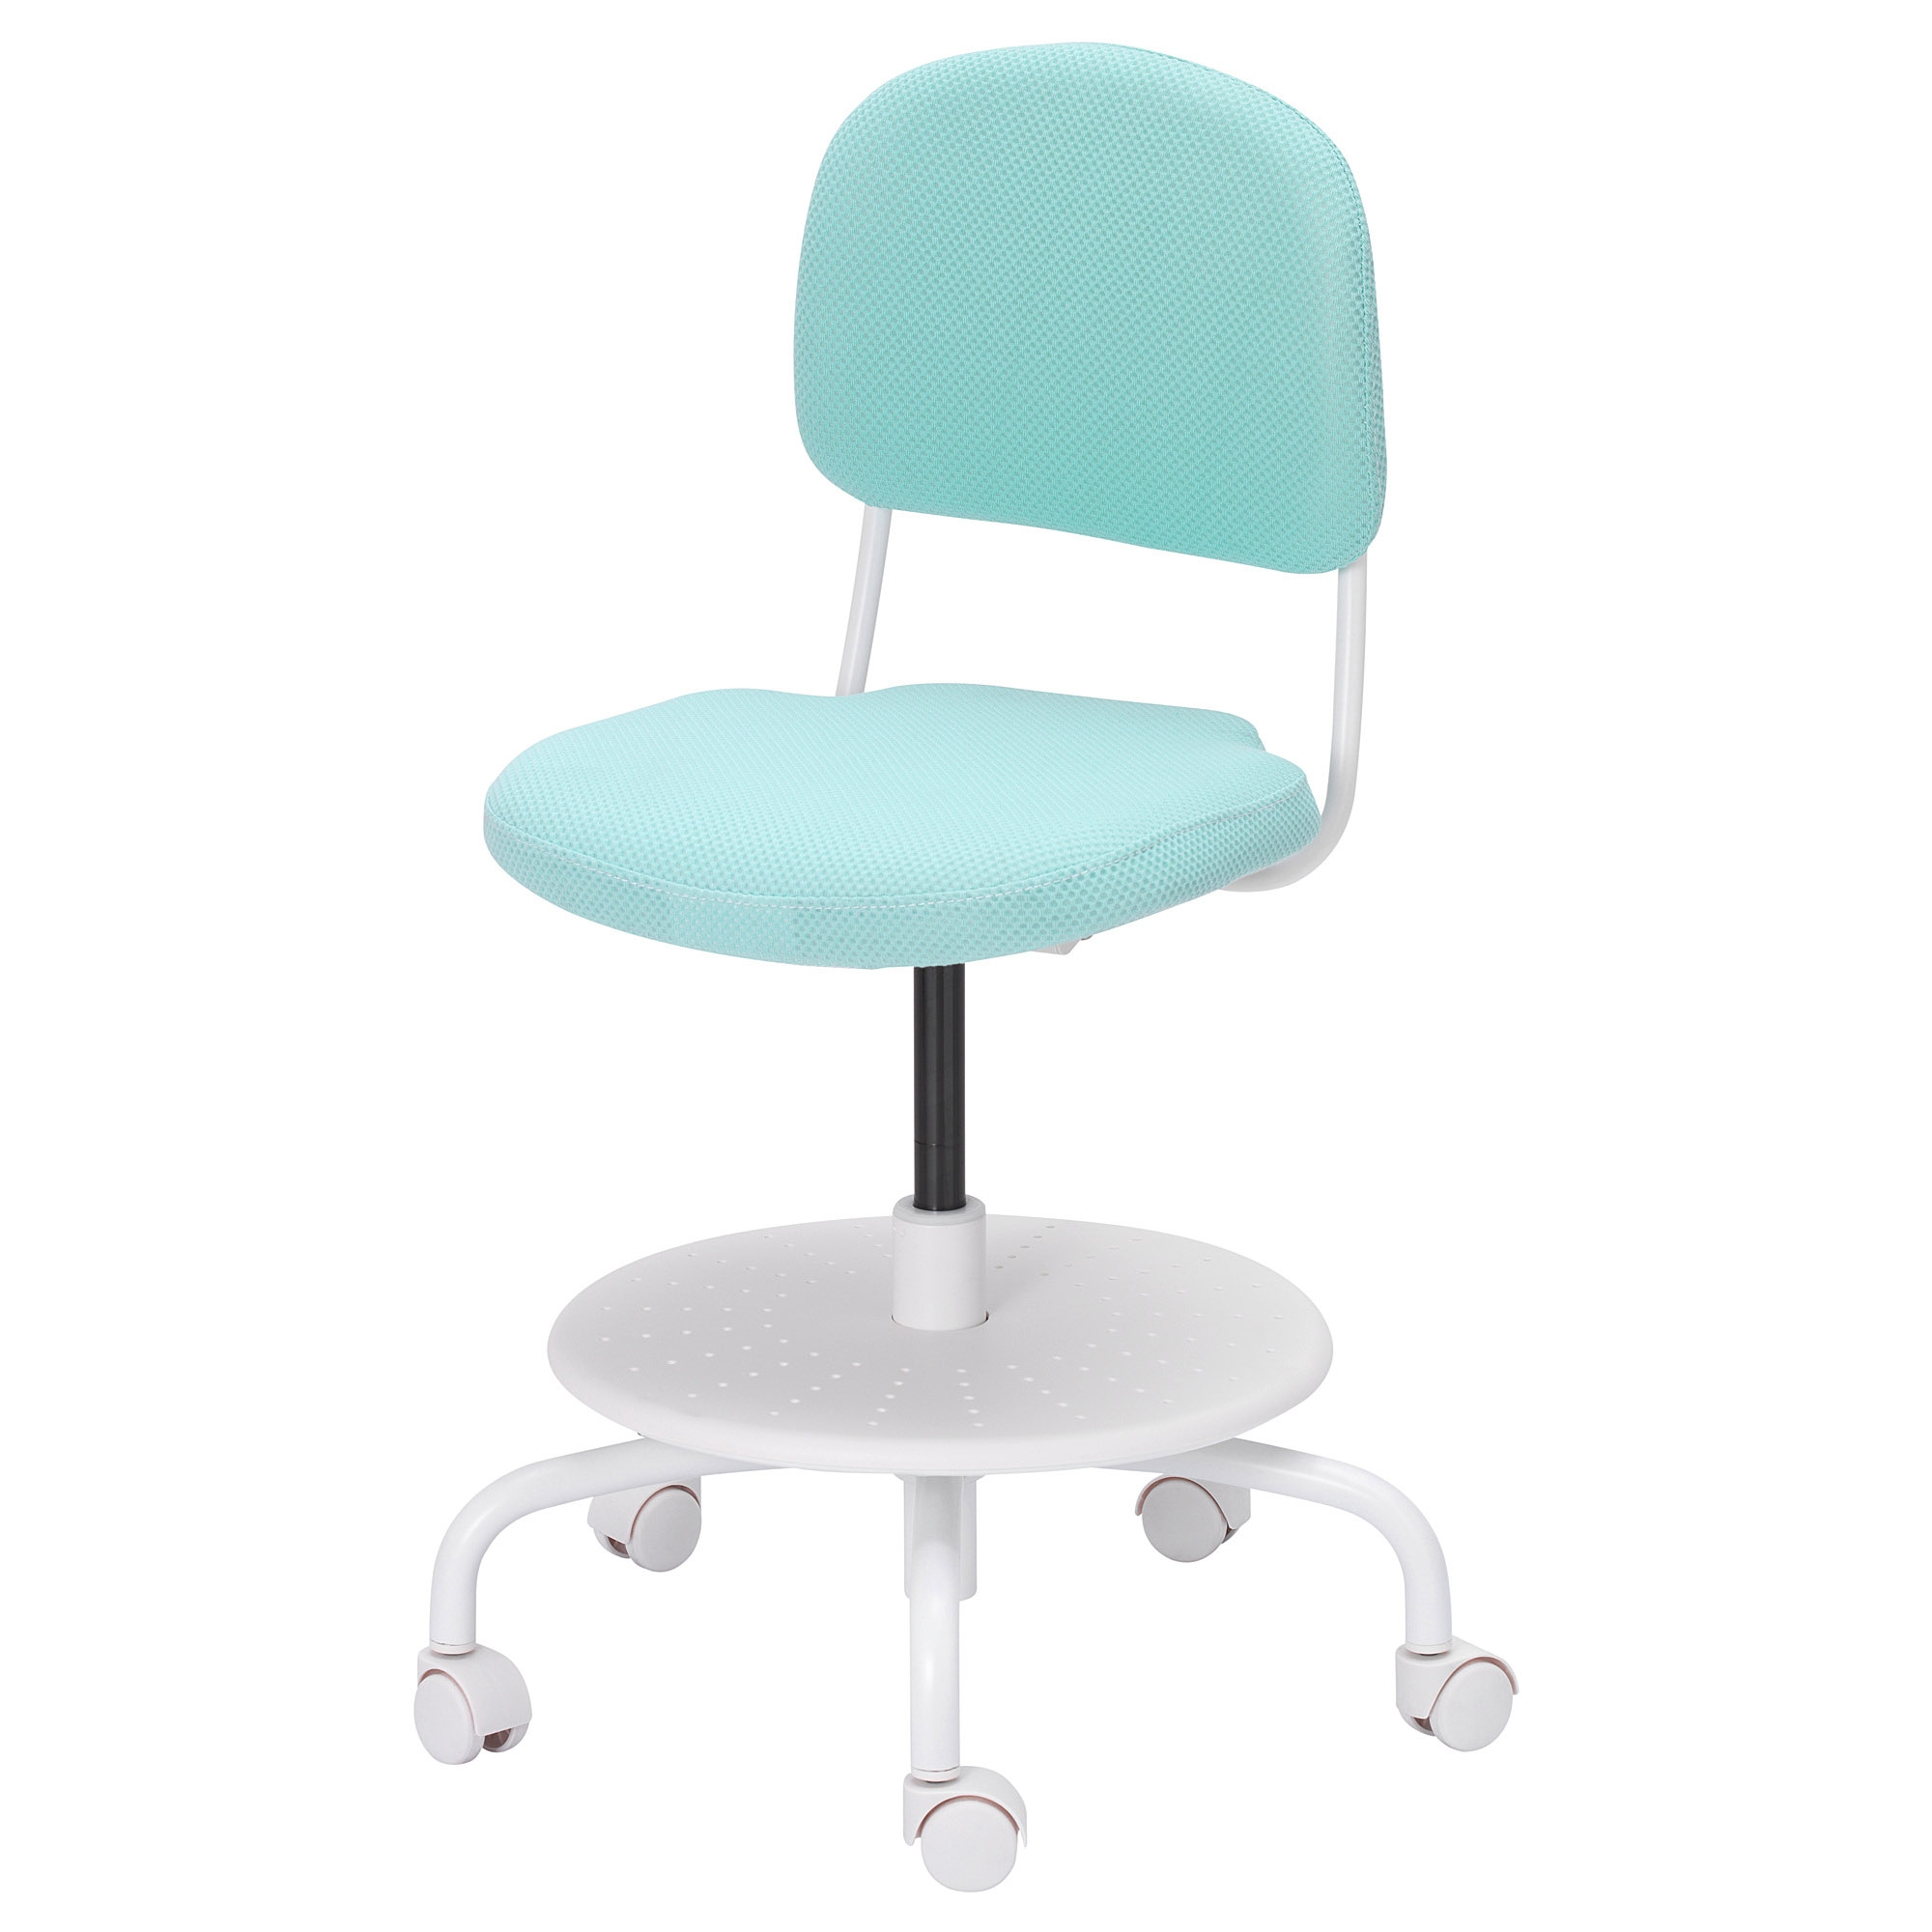 Swivel chair teal